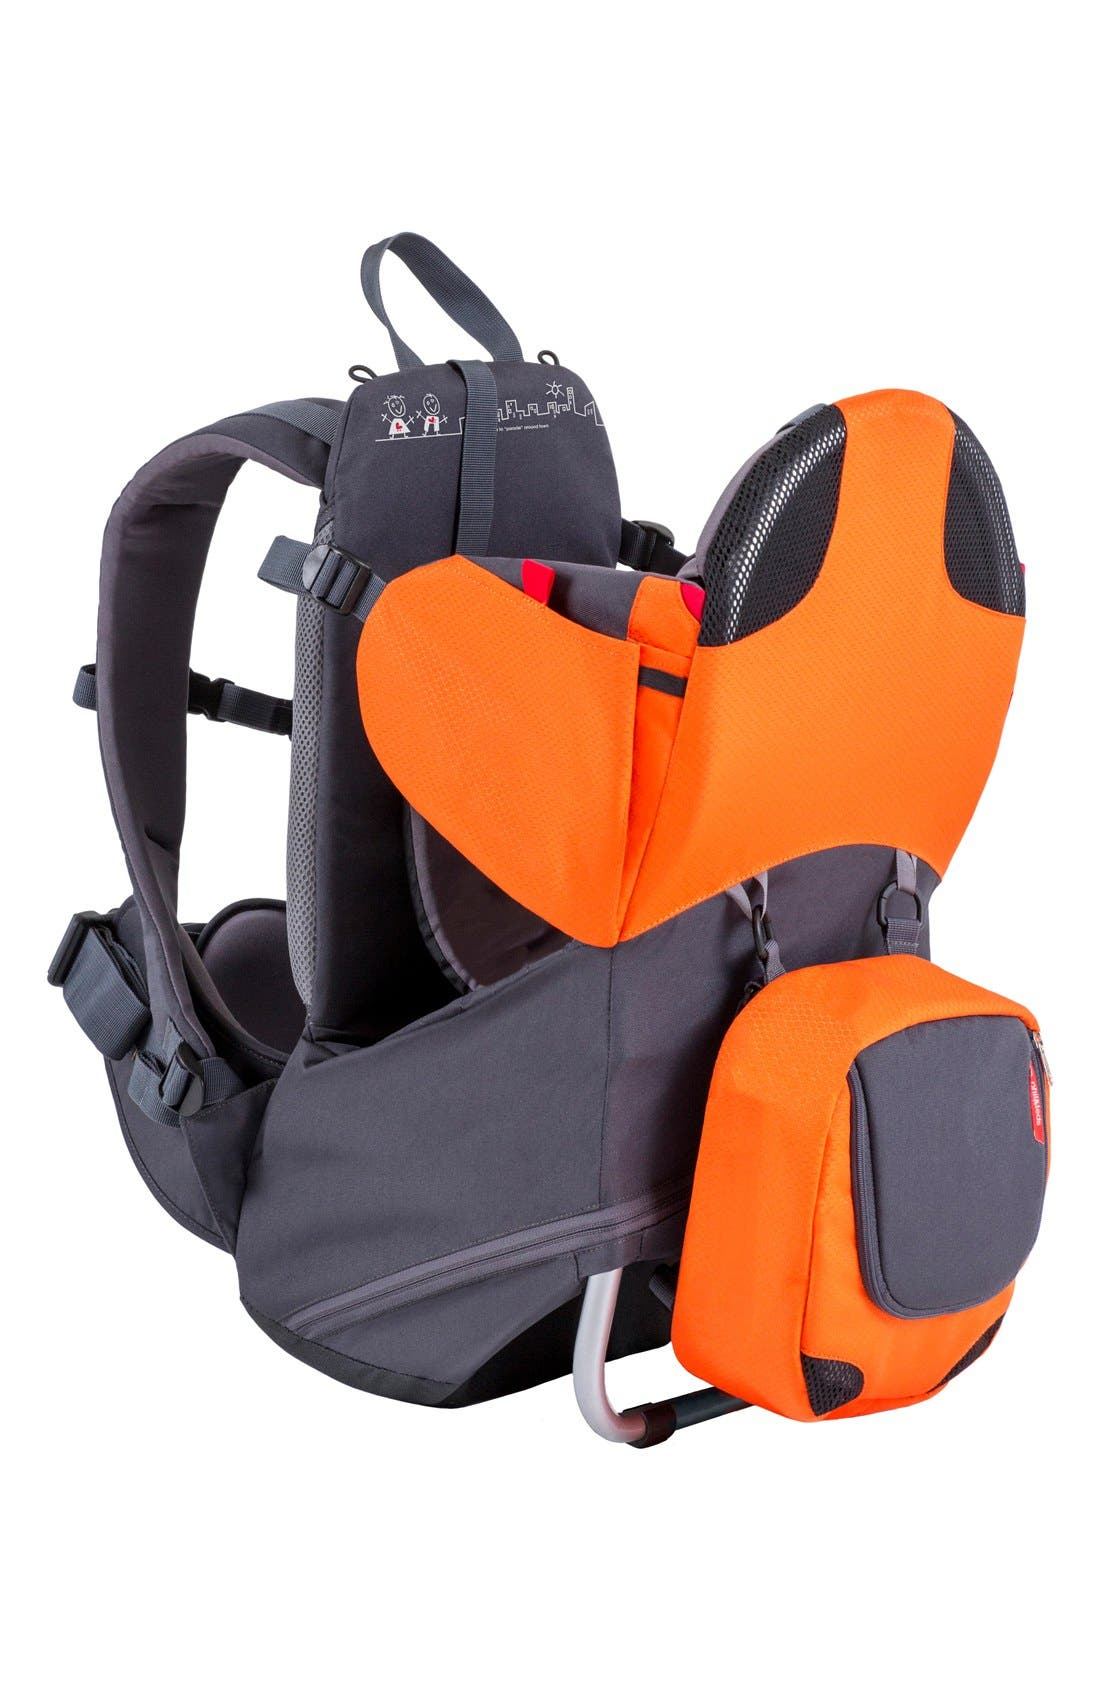 'Parade' Backpack Carrier,                             Main thumbnail 1, color,                             Orange/ Grey